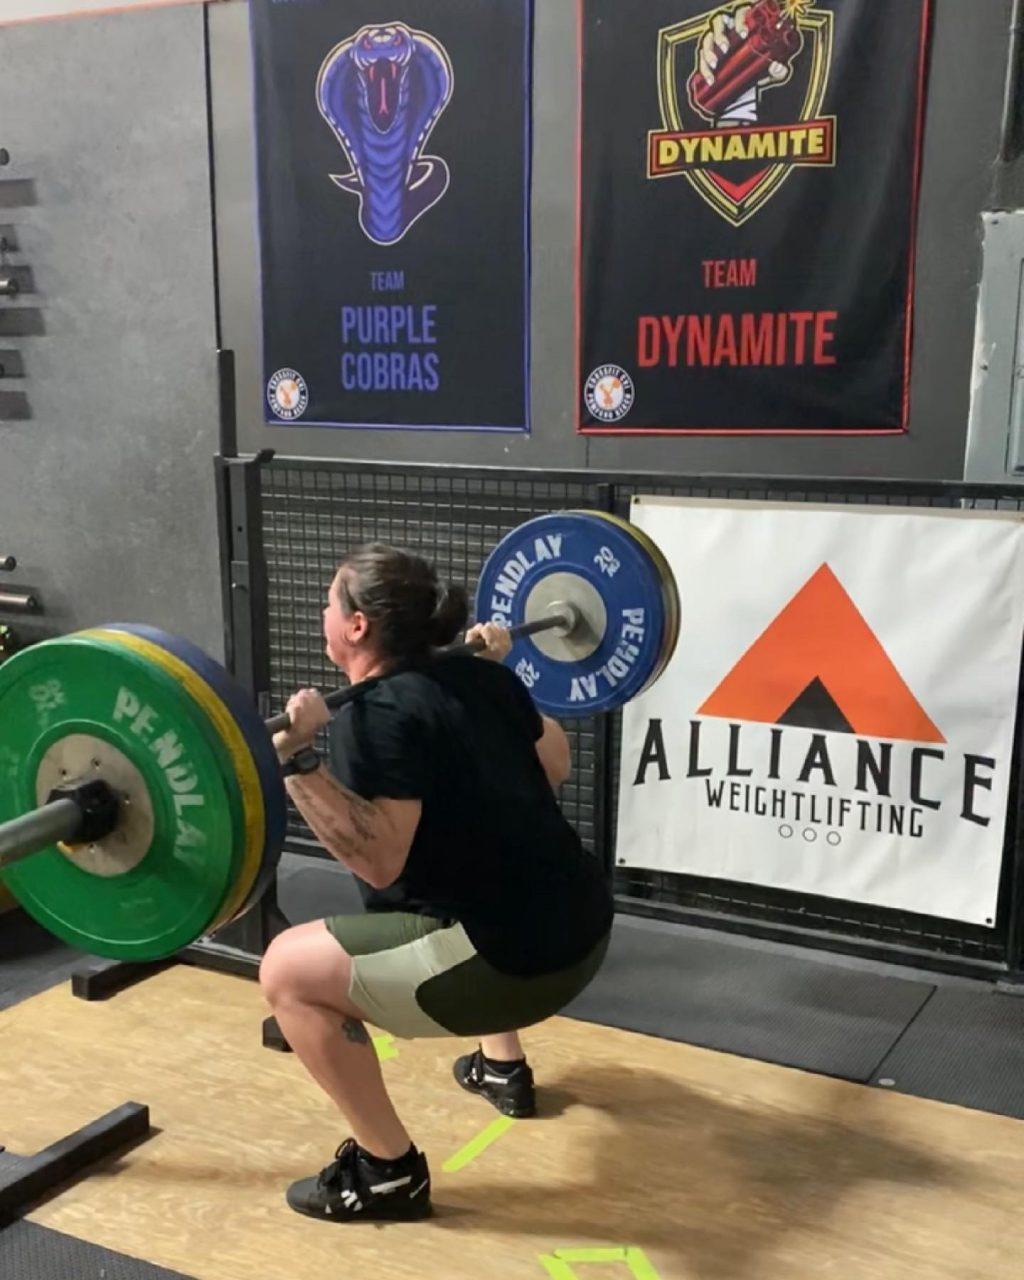 Personal Trainer Fort-lauderdale, Florida - Lauren Albert